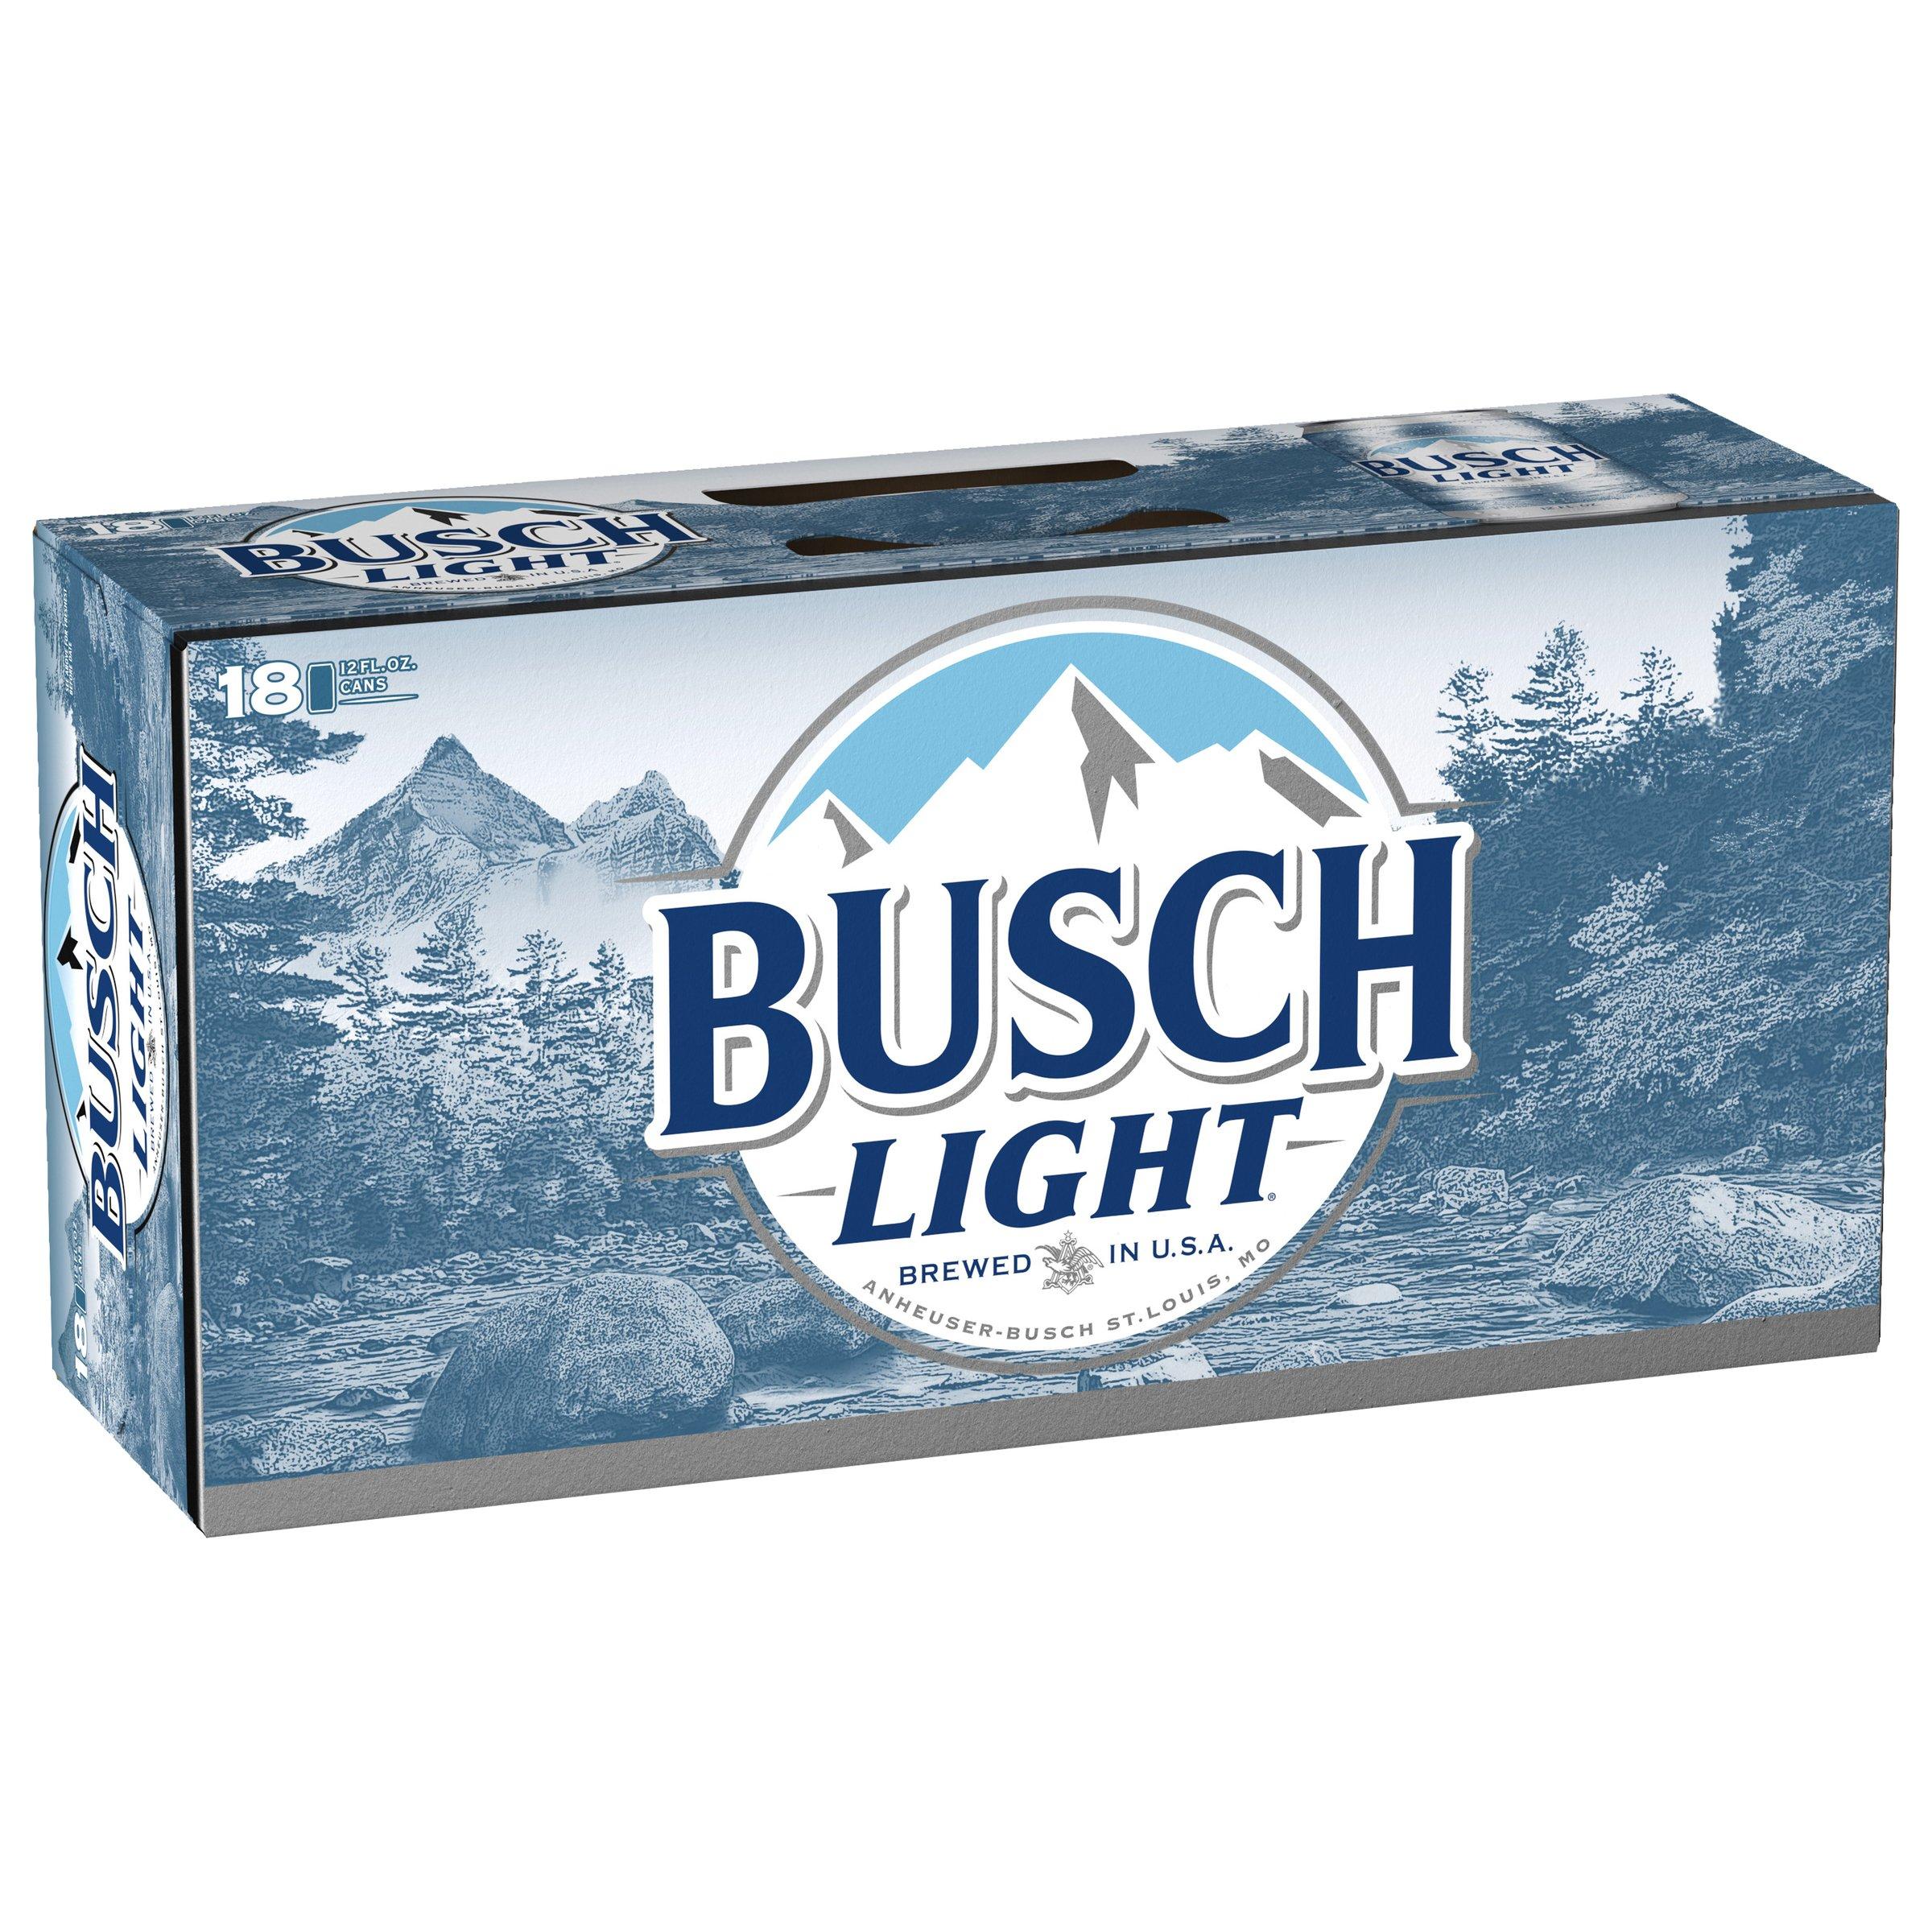 Busch Light Beer 12 Oz Cans Shop Beer At H E B